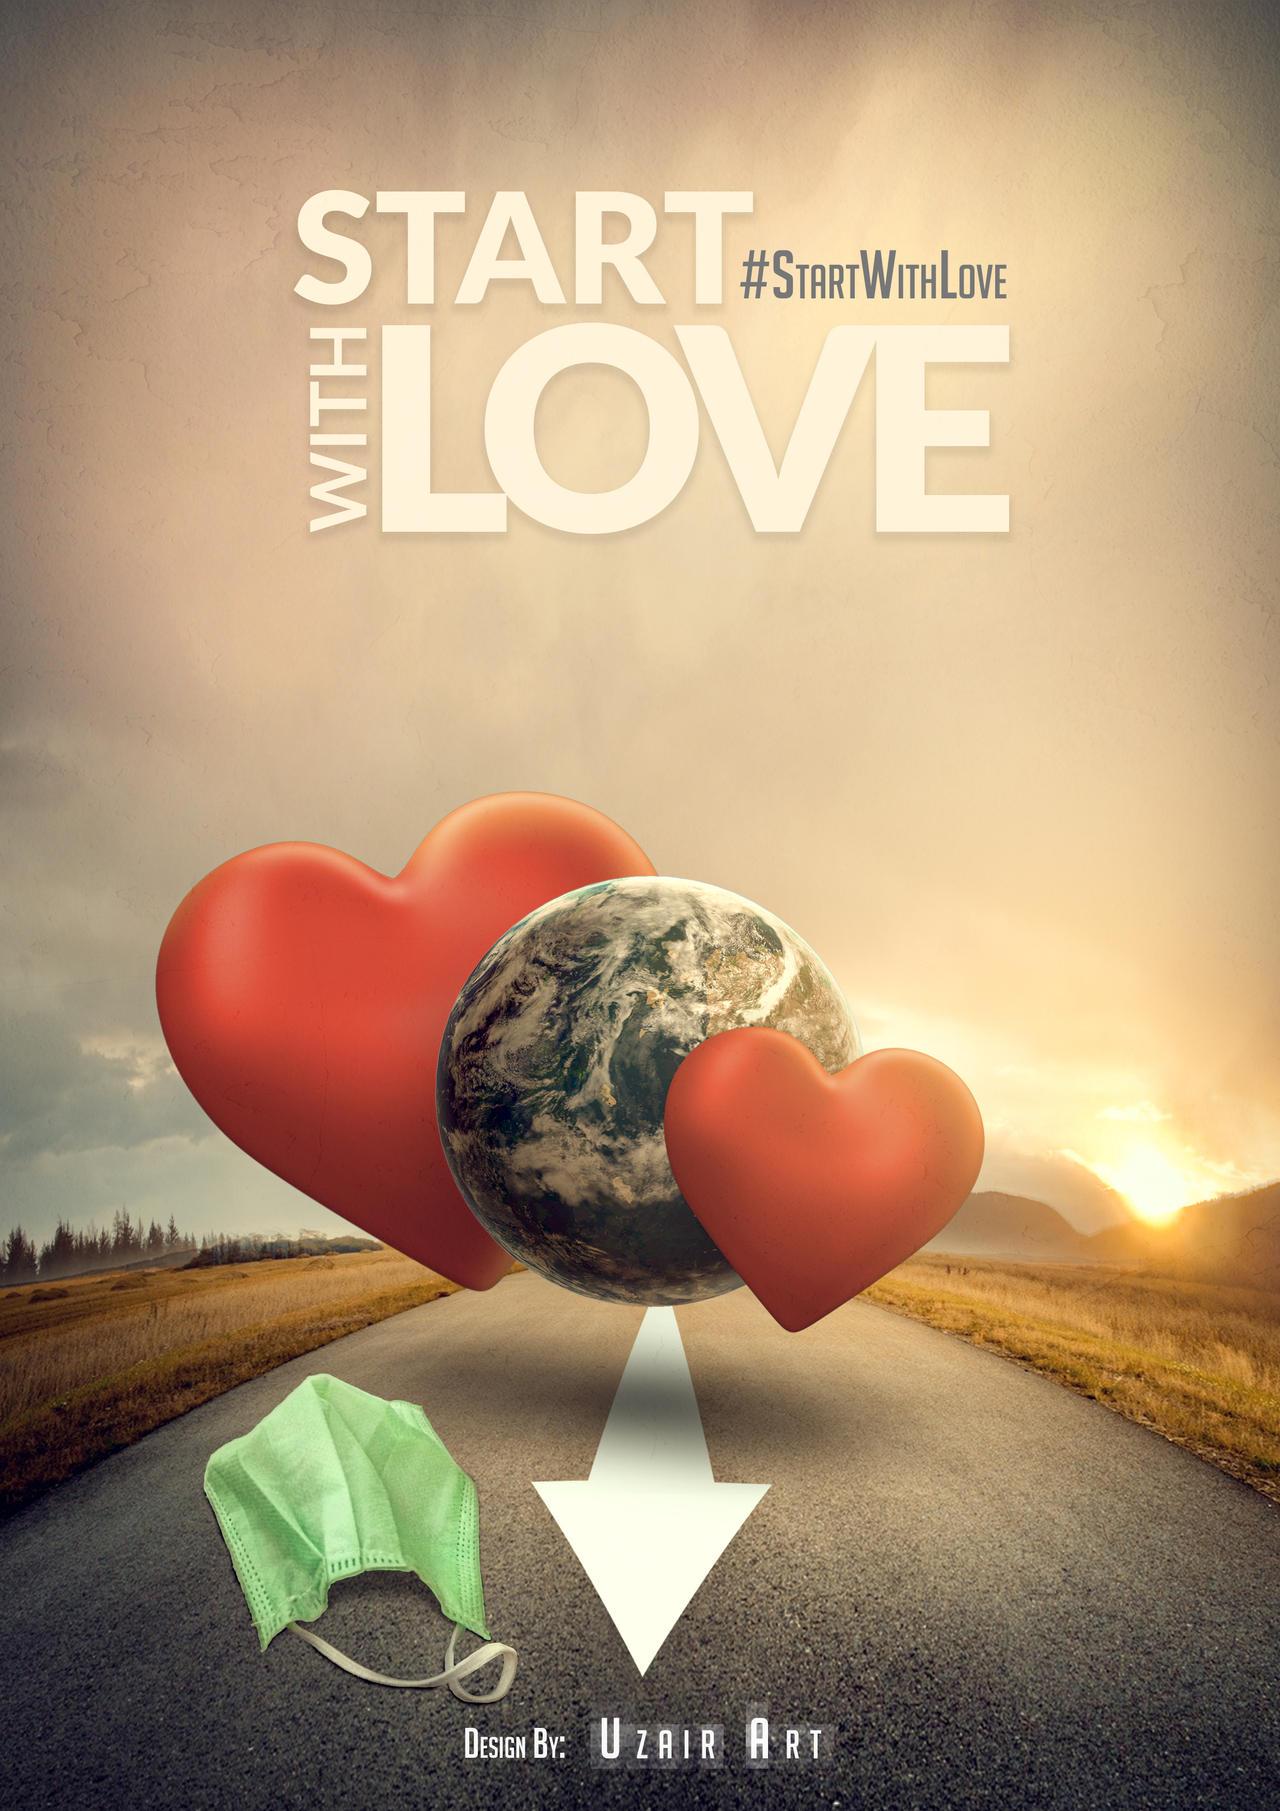 #StartWithLove